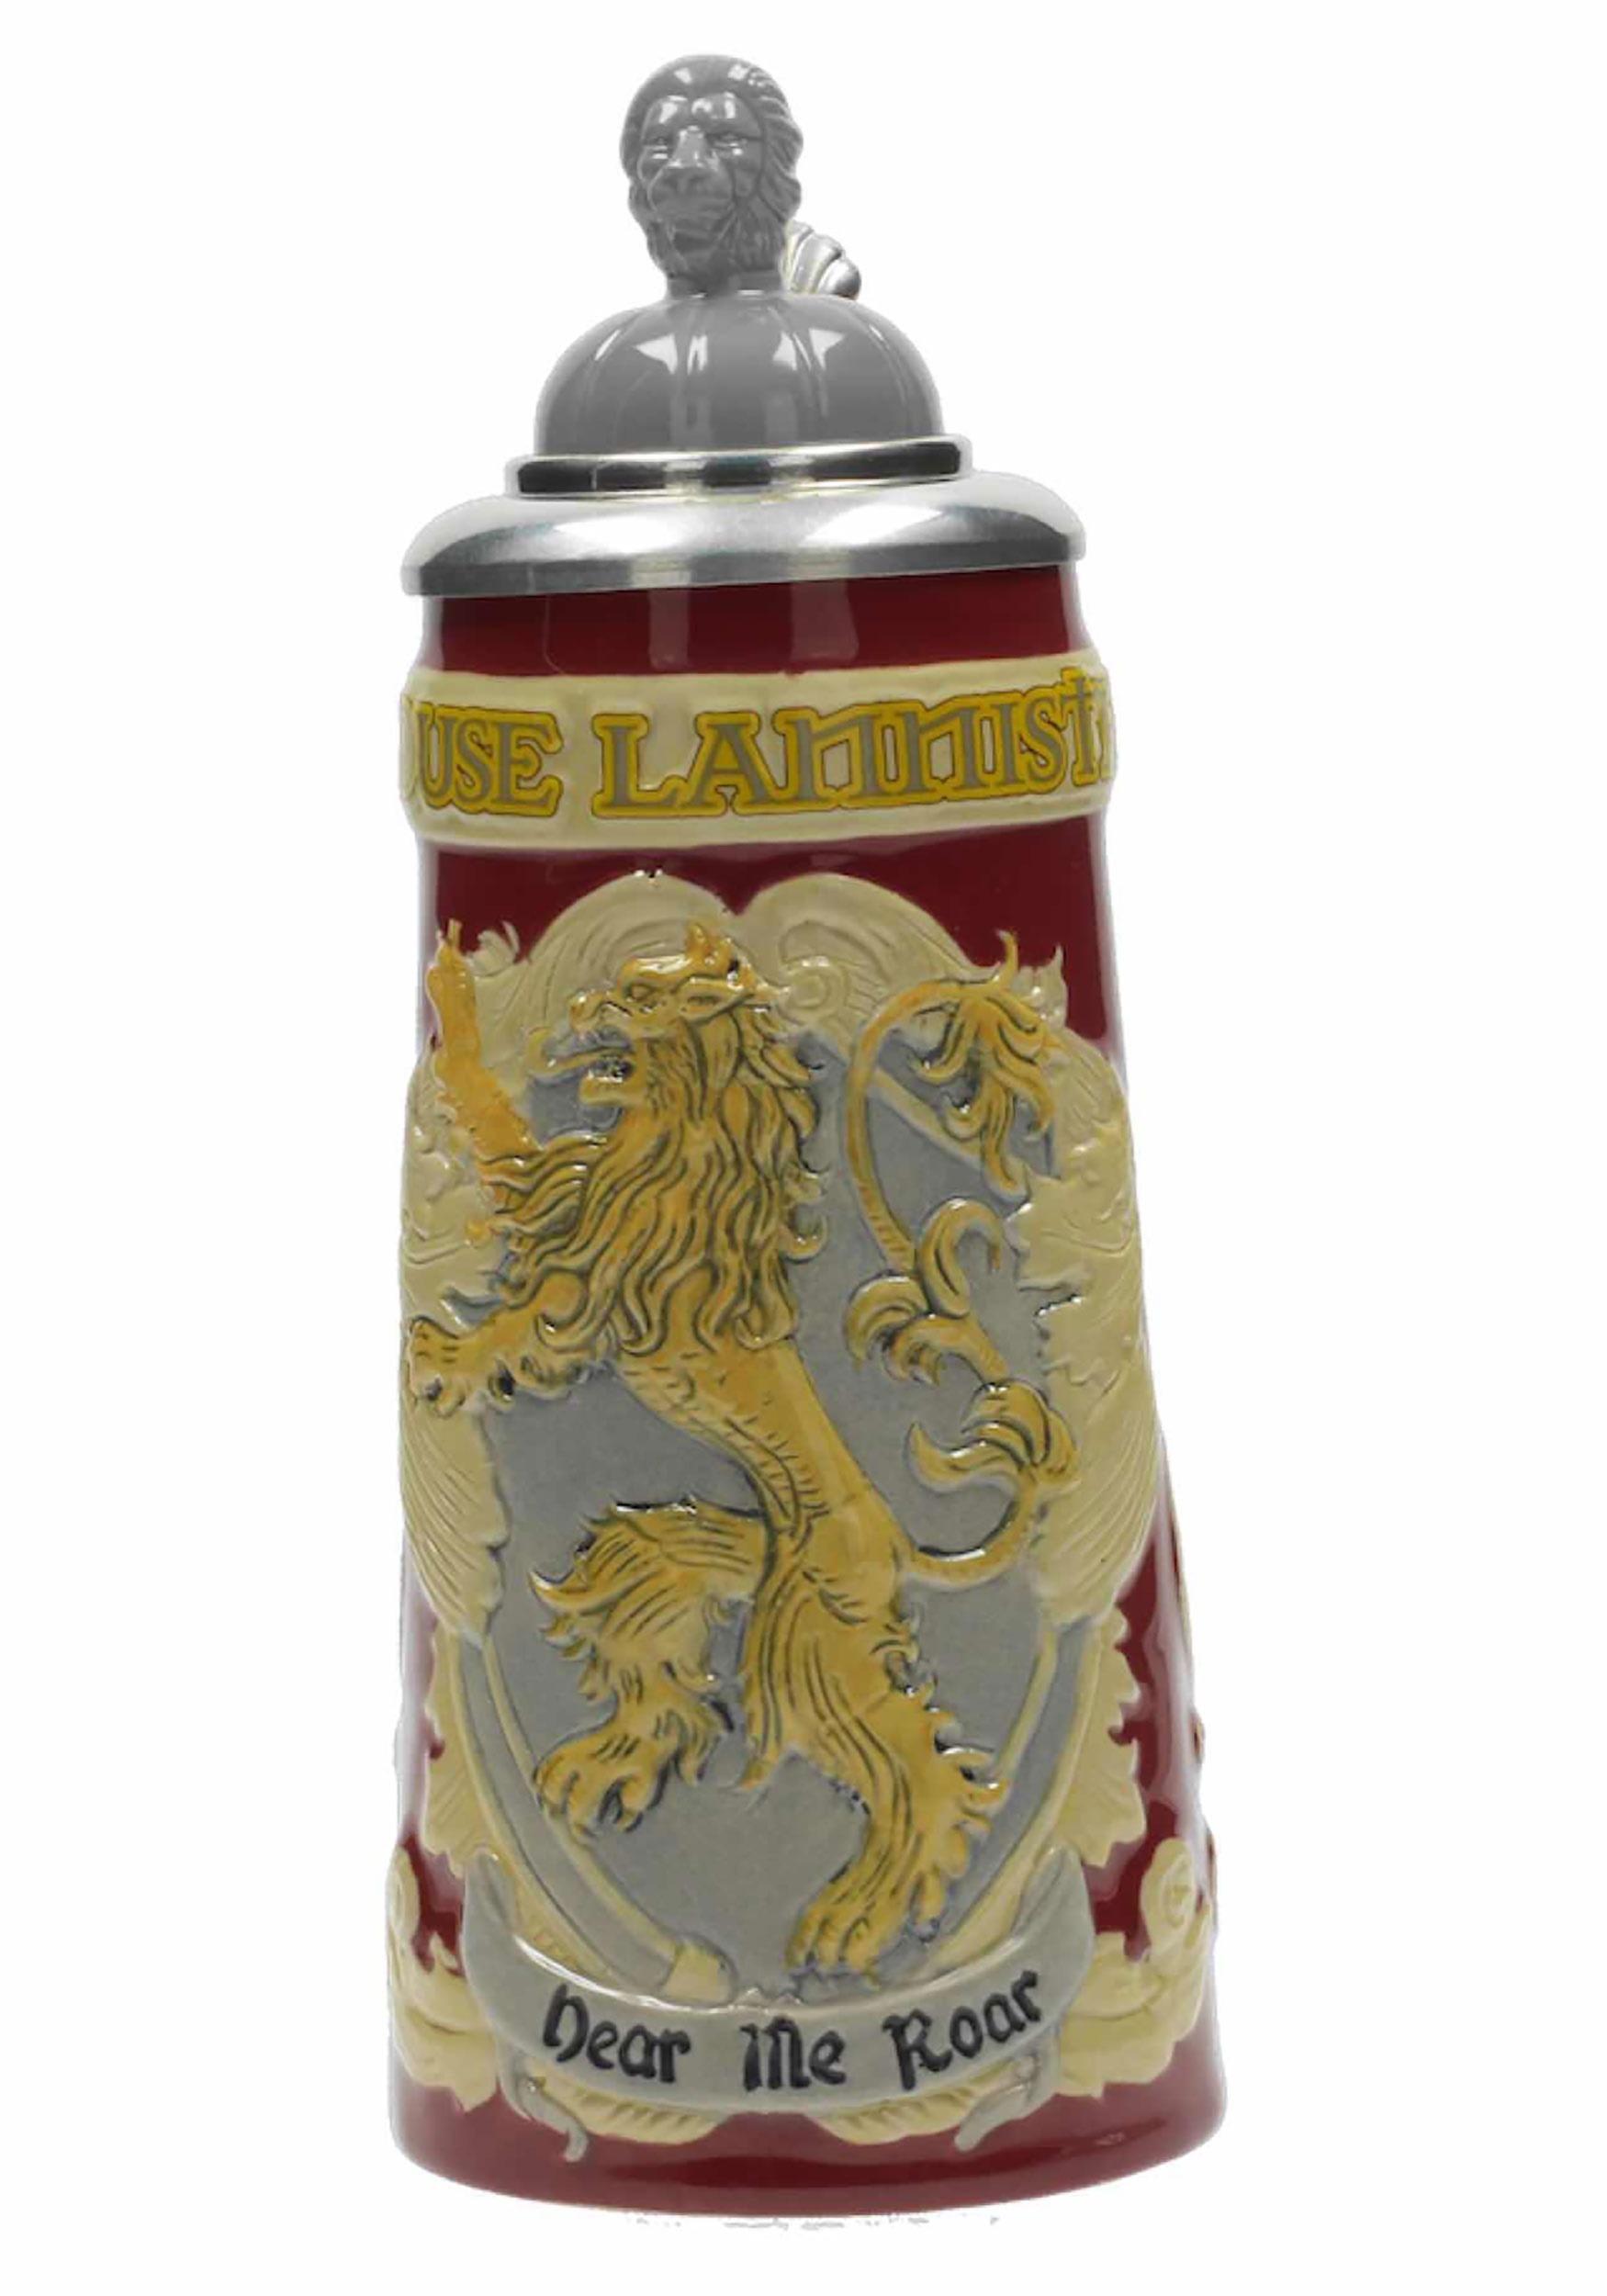 Game of Thrones House Lannister Ceramic Stein Mug